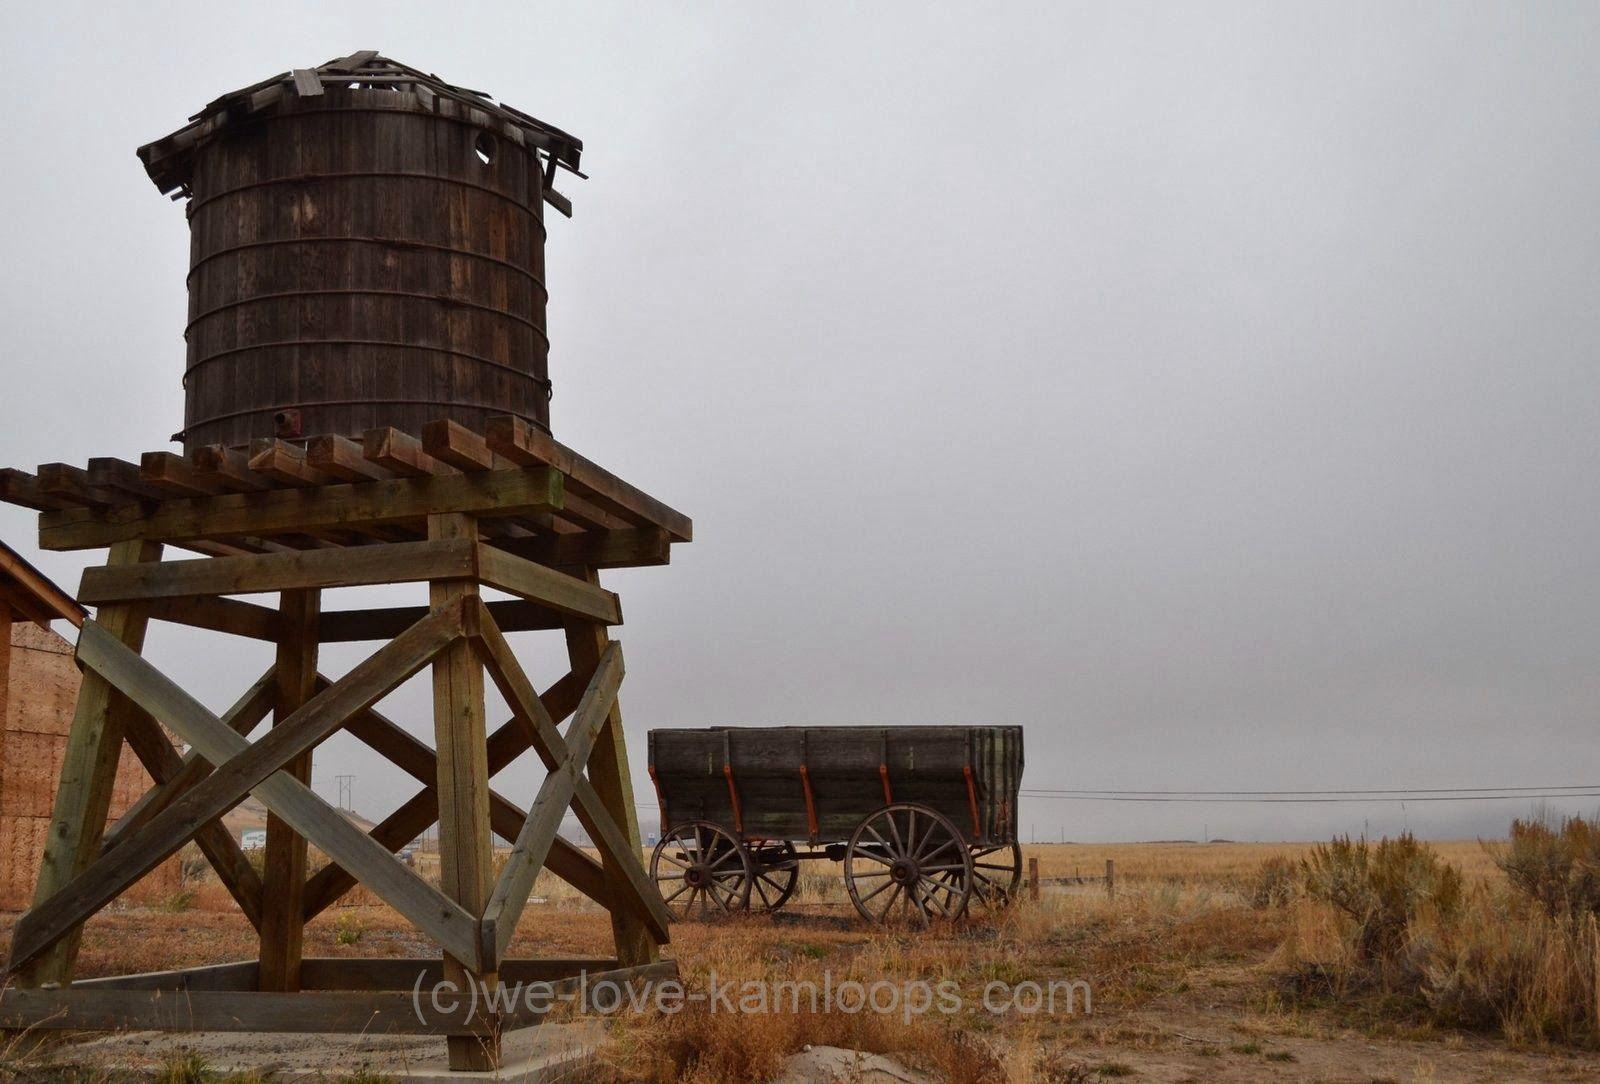 Walhachin Wooden Irrigation Flume Kamloops Bc Water Tower Western Theme Water Storage